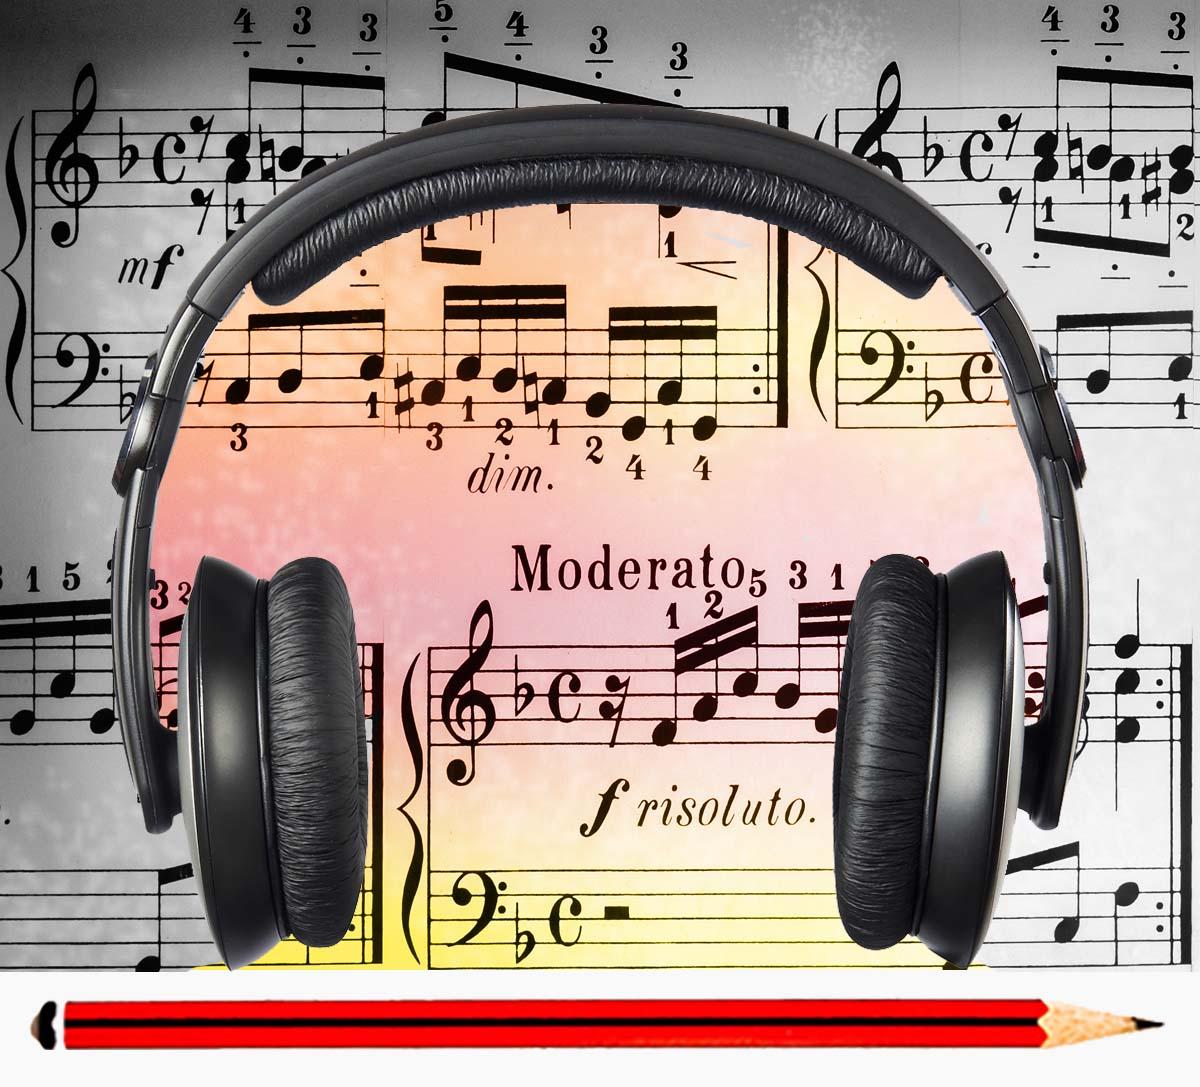 copywriting is music